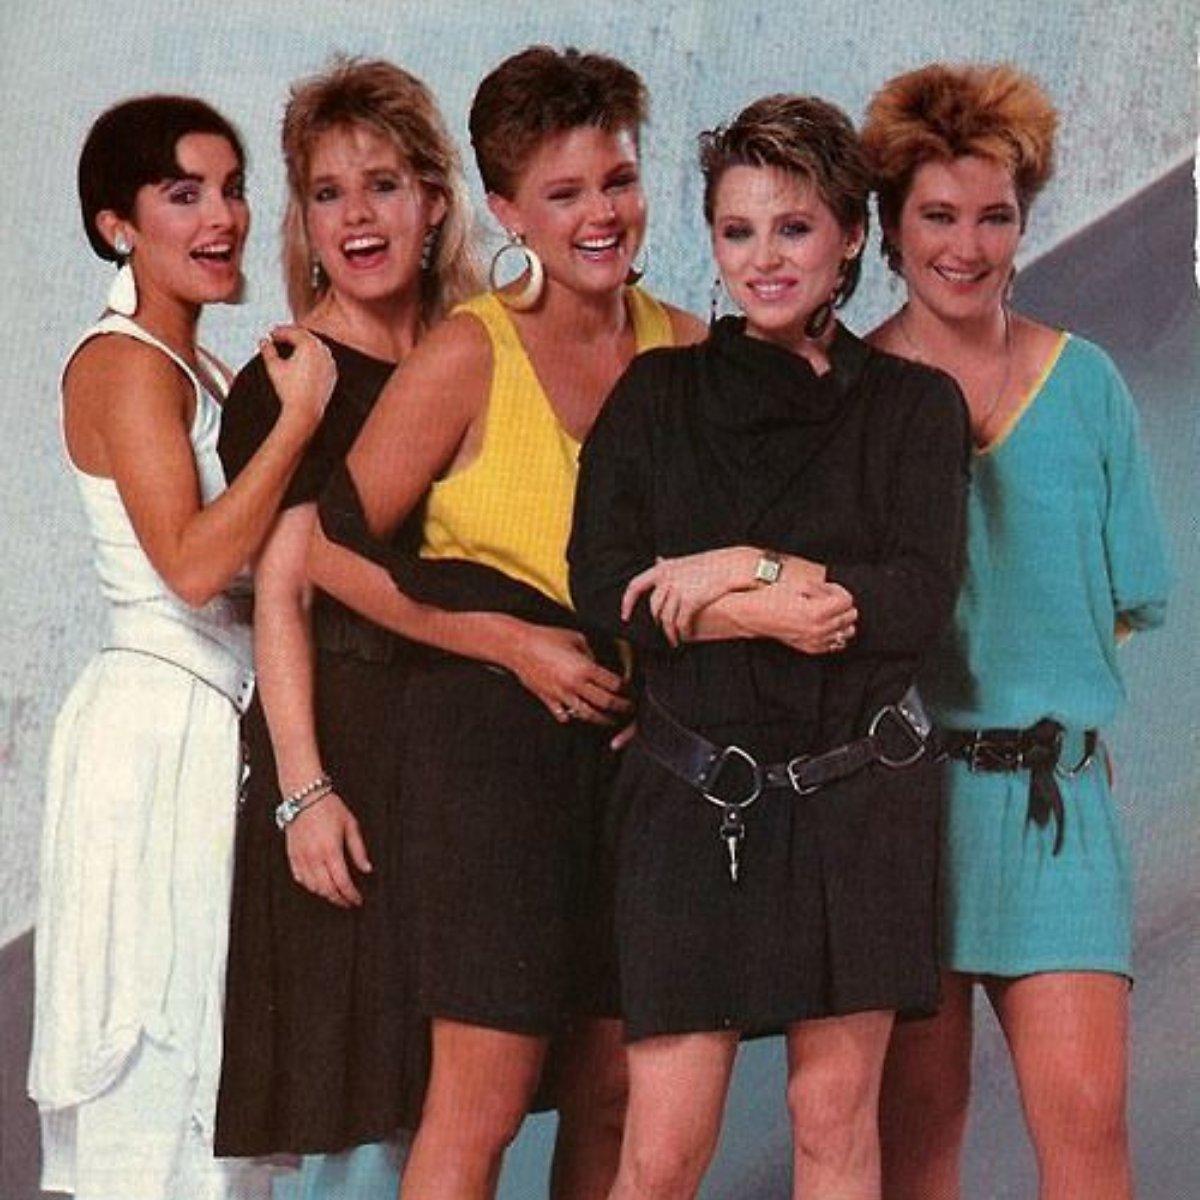 80's pop group The Go-Go's promo image circa 1980's